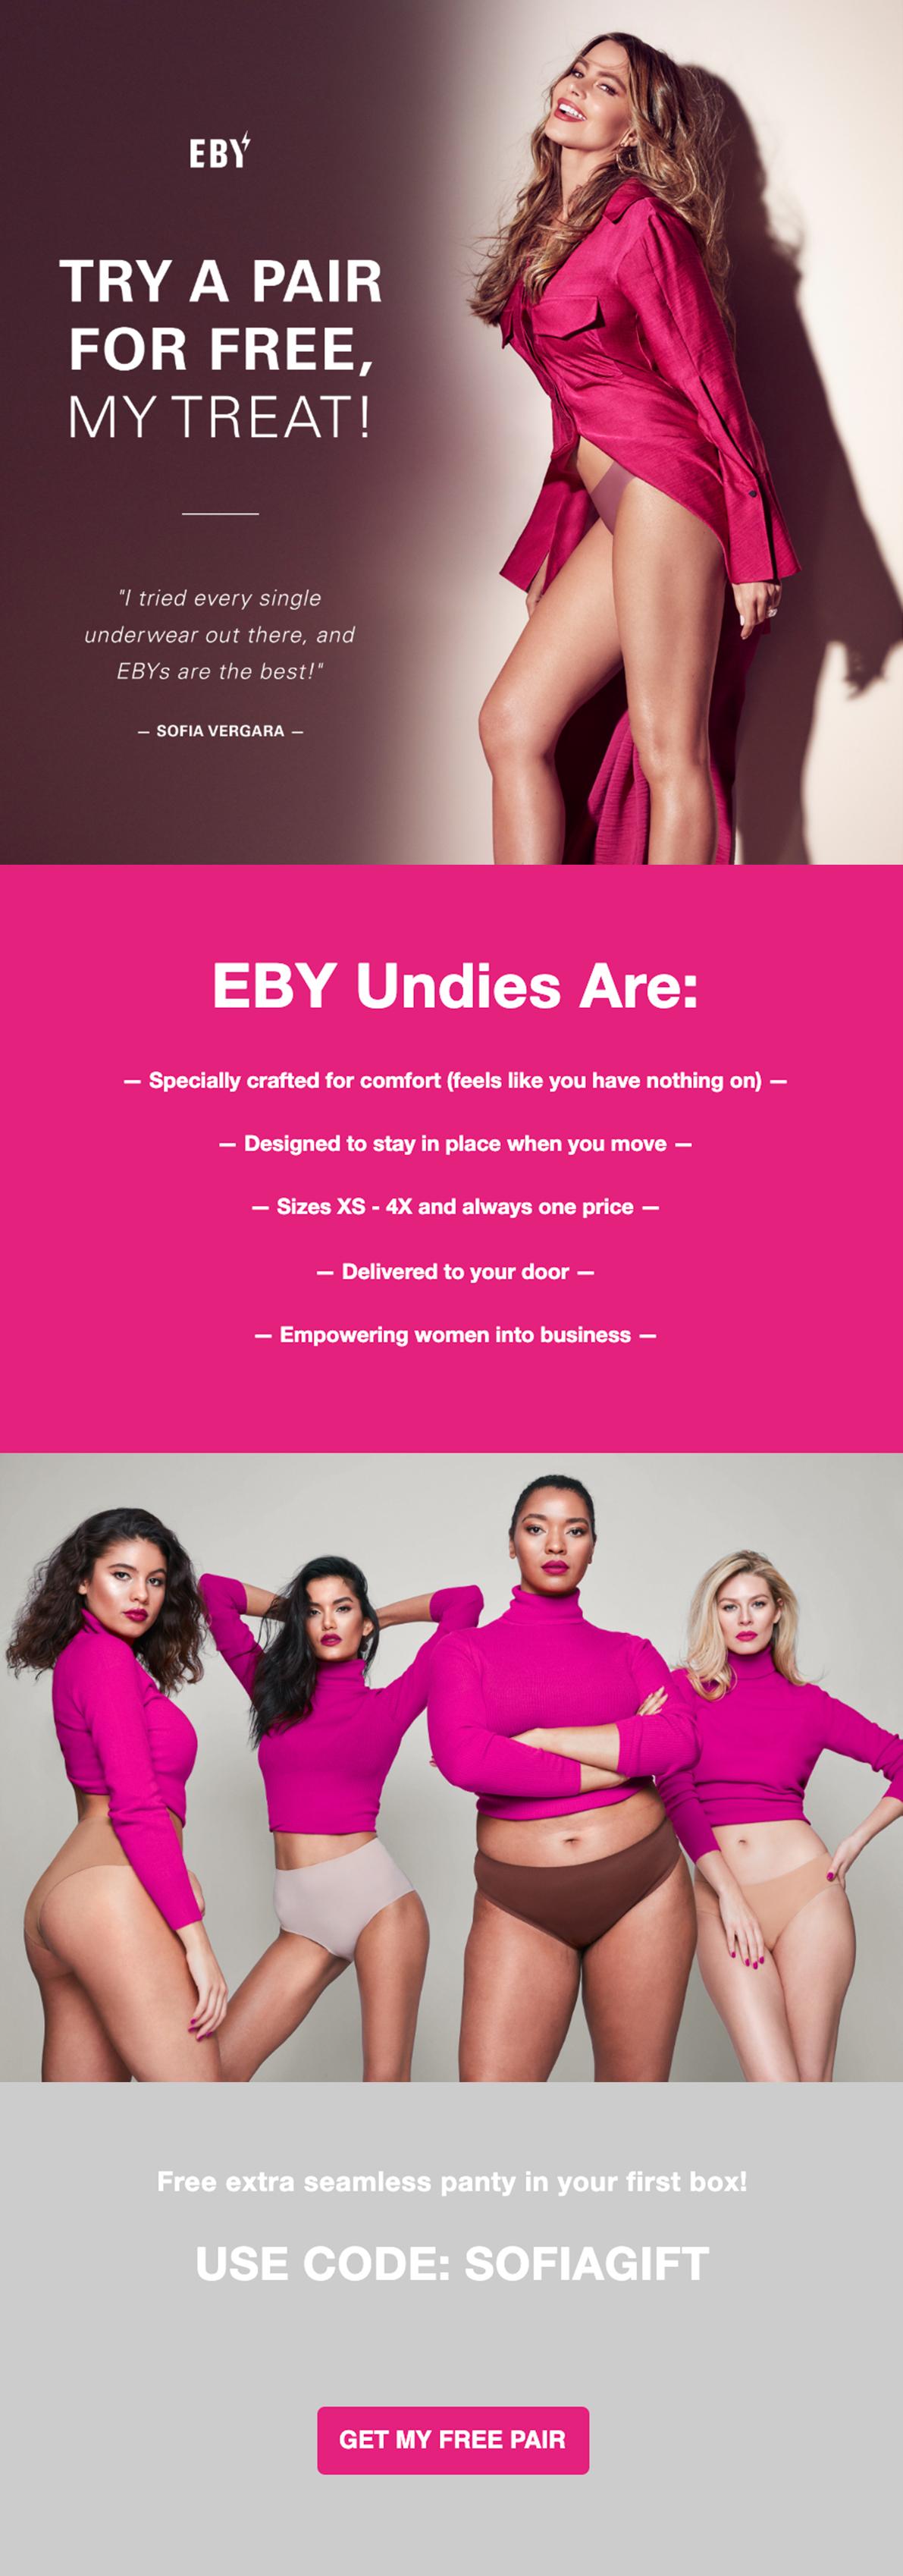 EBY-My-Treat-Email.jpg